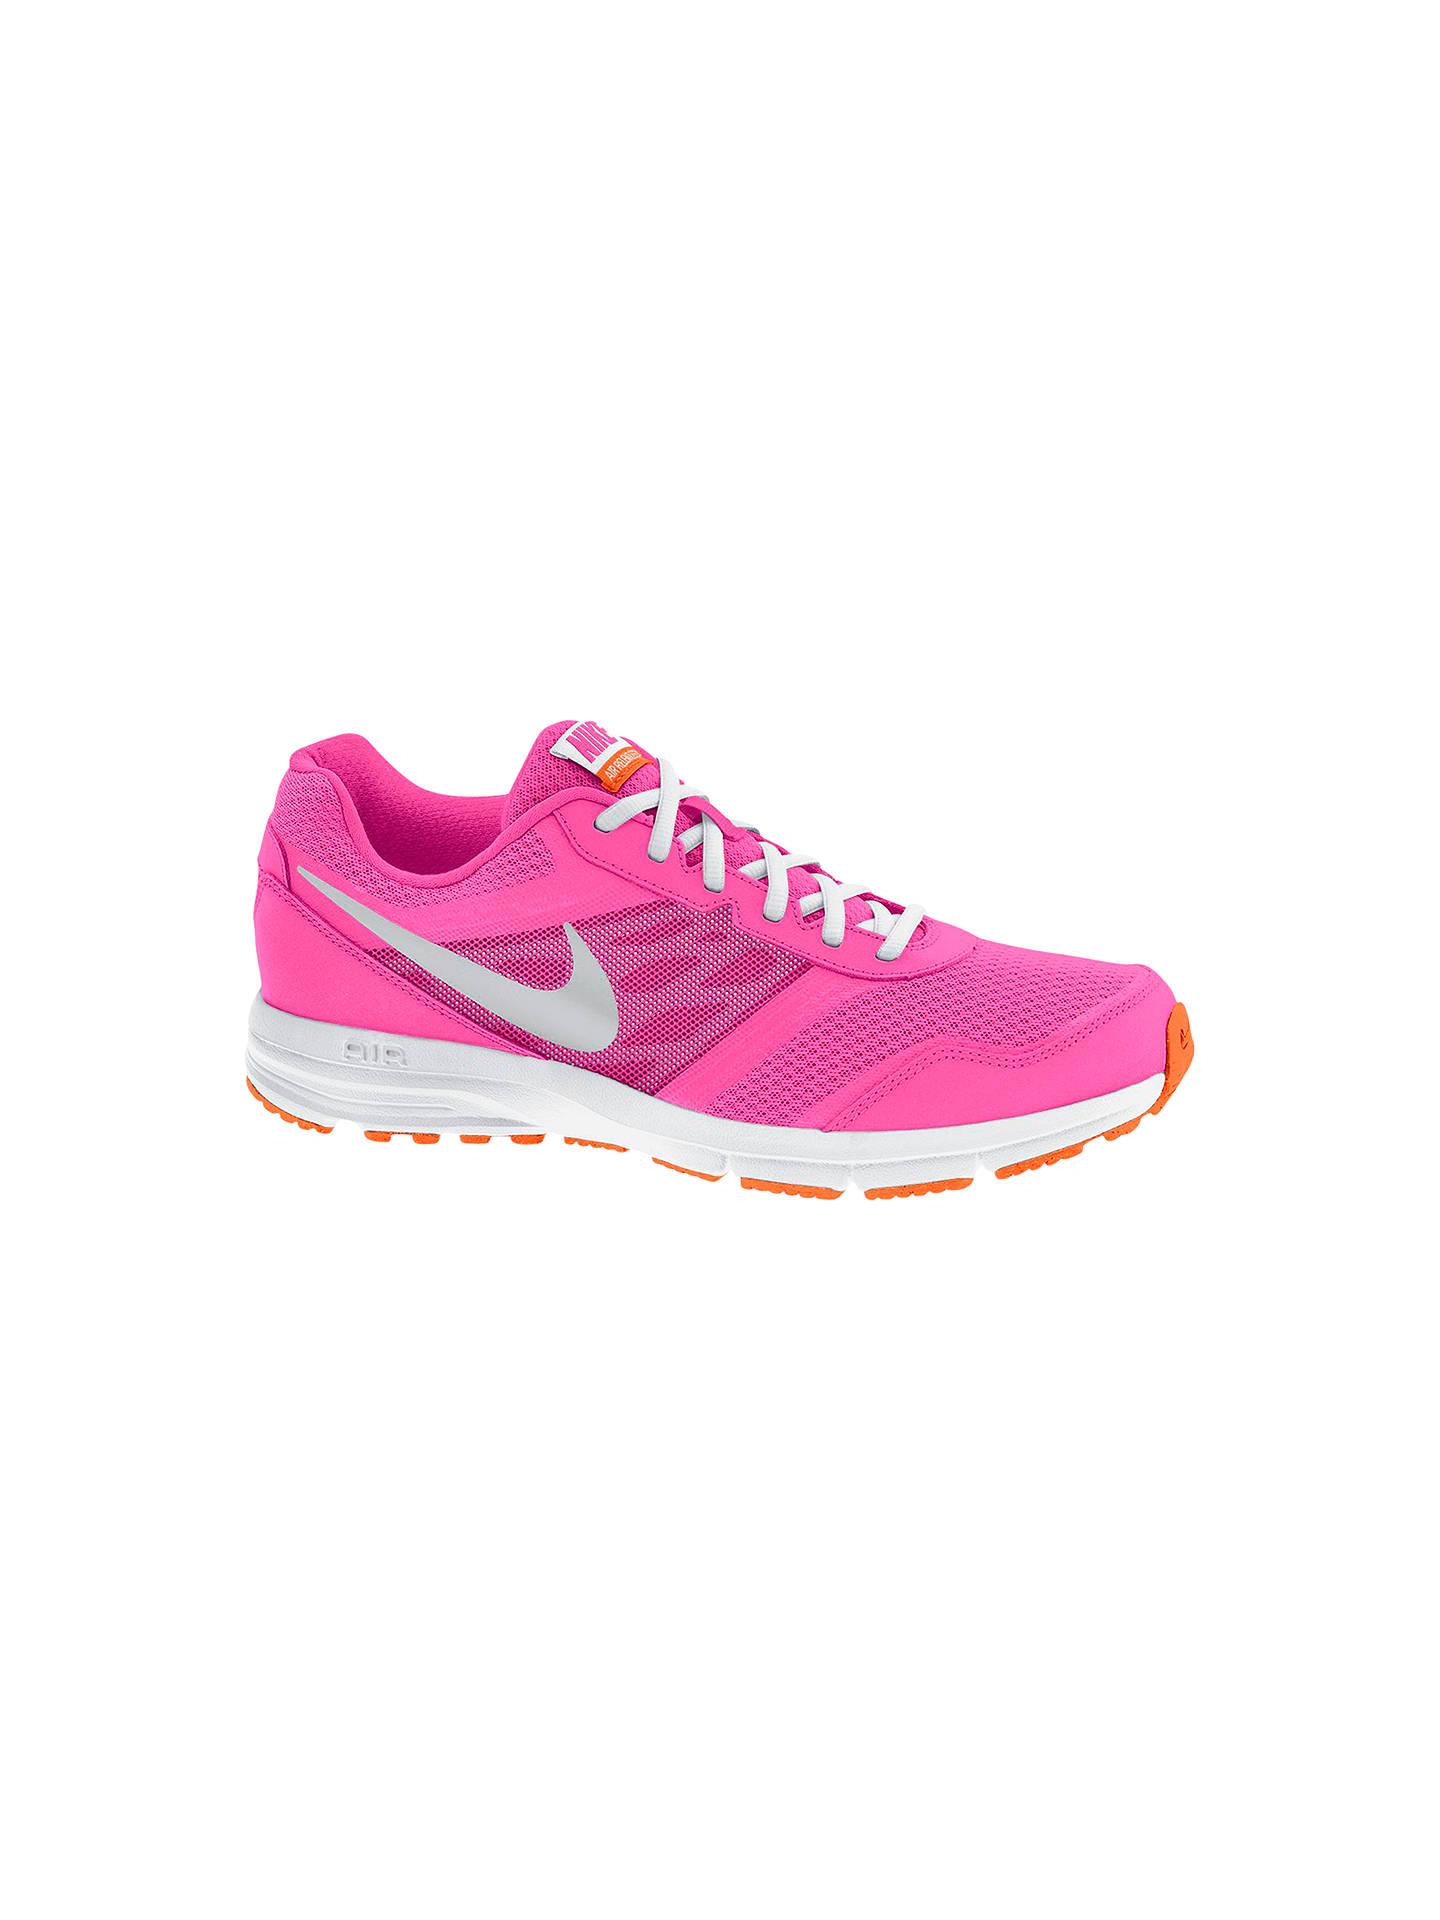 88405331eb1a5 Buy Nike Air Relentless 4 Women s Running Shoes